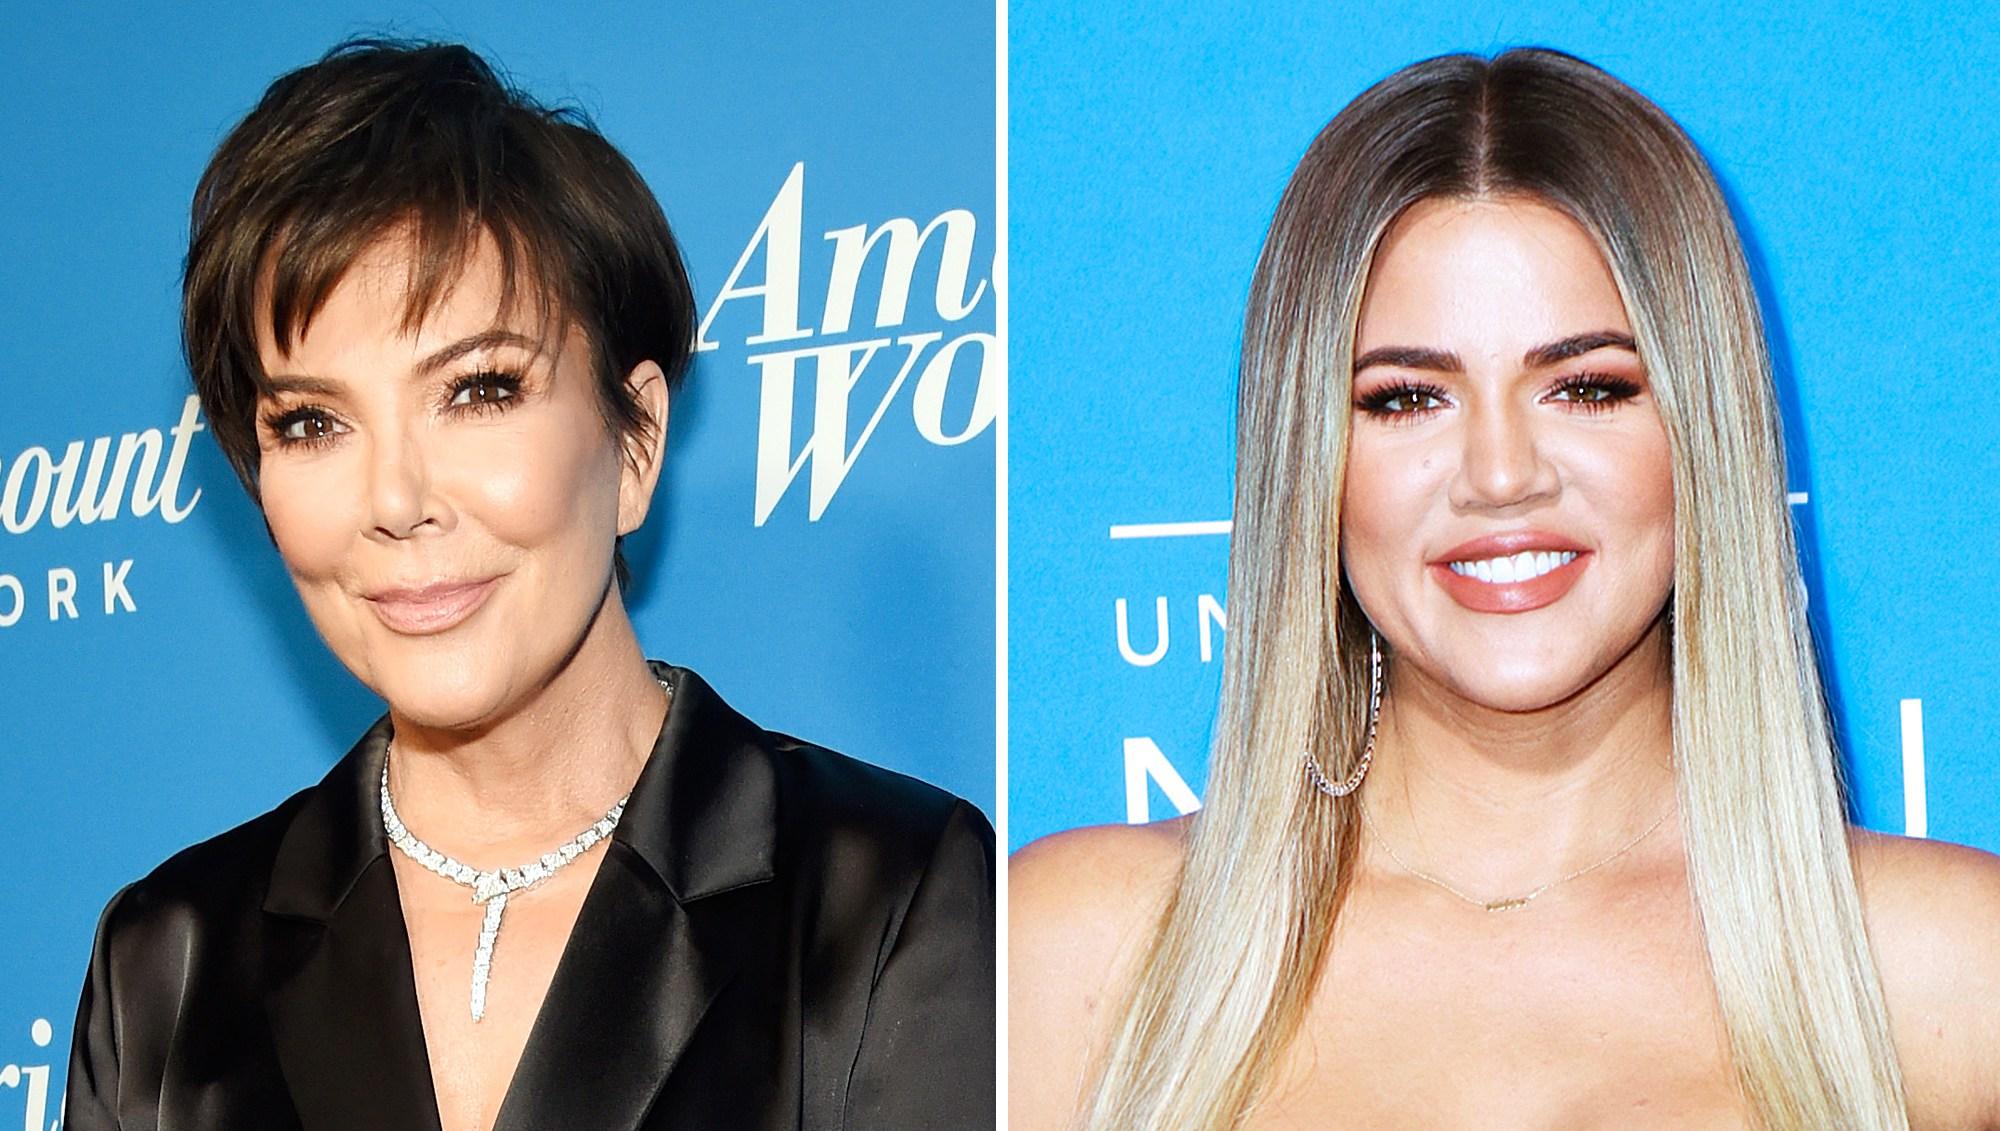 Kris Jenner Khloe Kardashian Coming Home